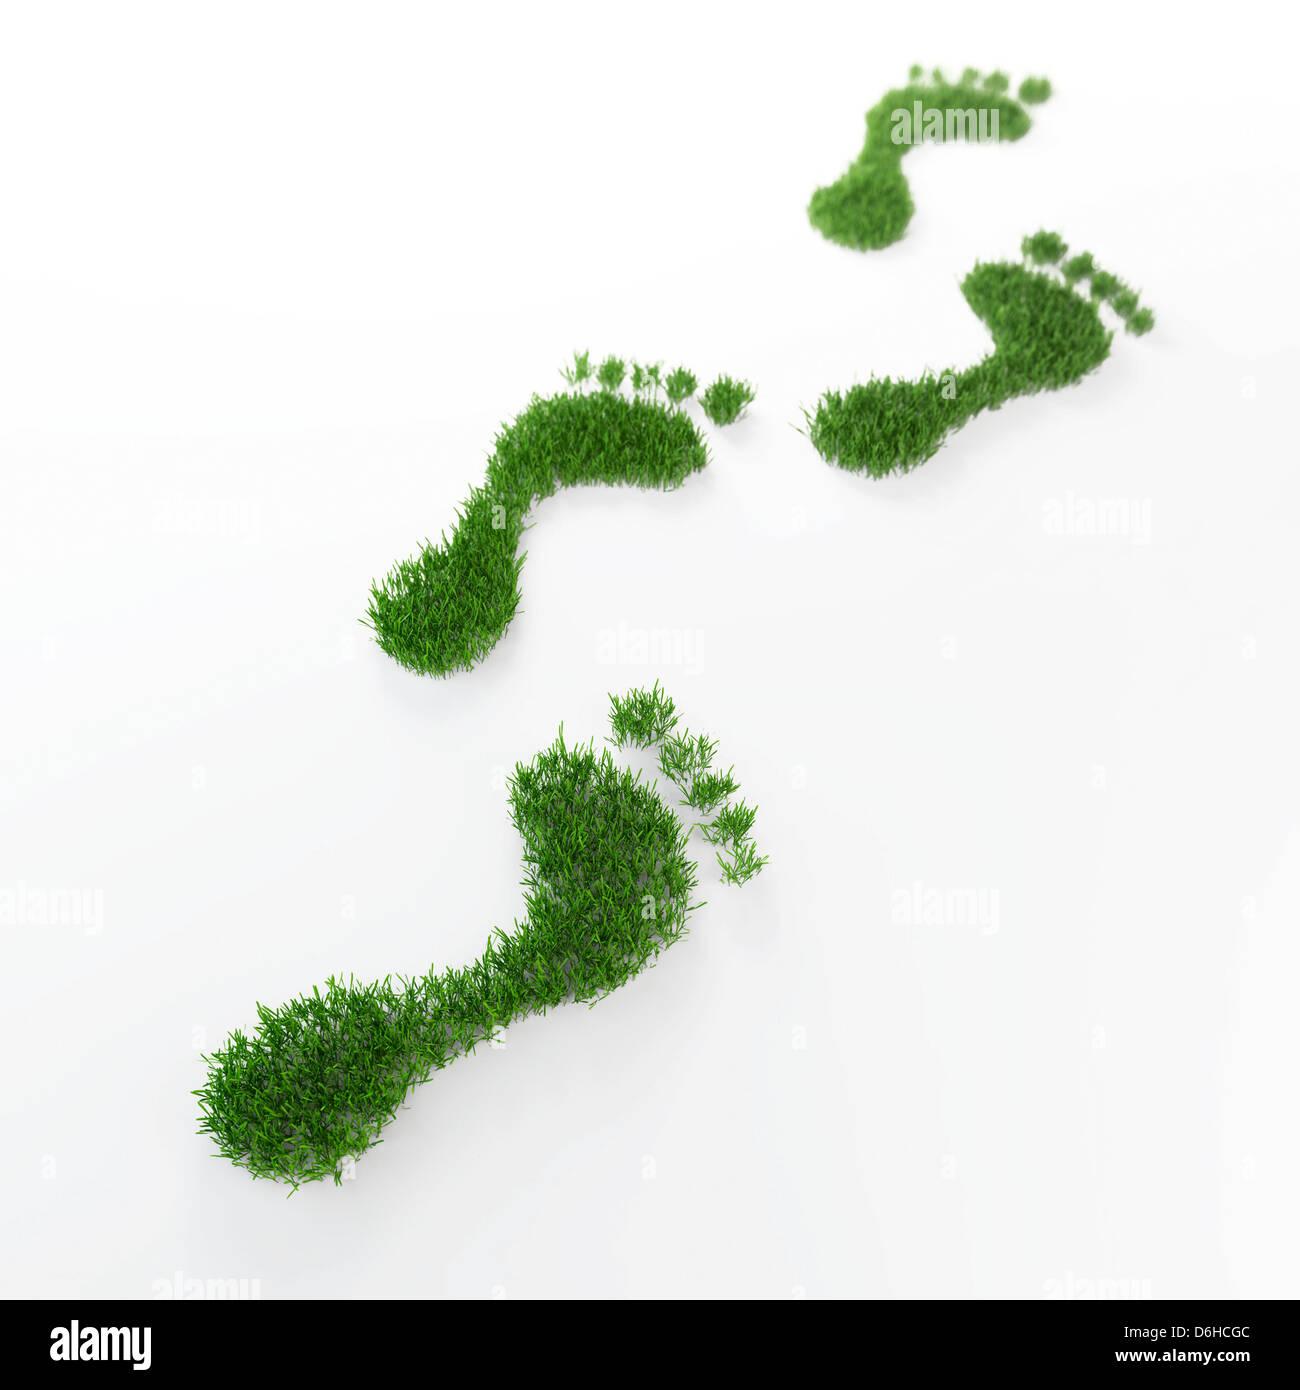 Impronta ecologica, opere d'arte concettuale Immagini Stock